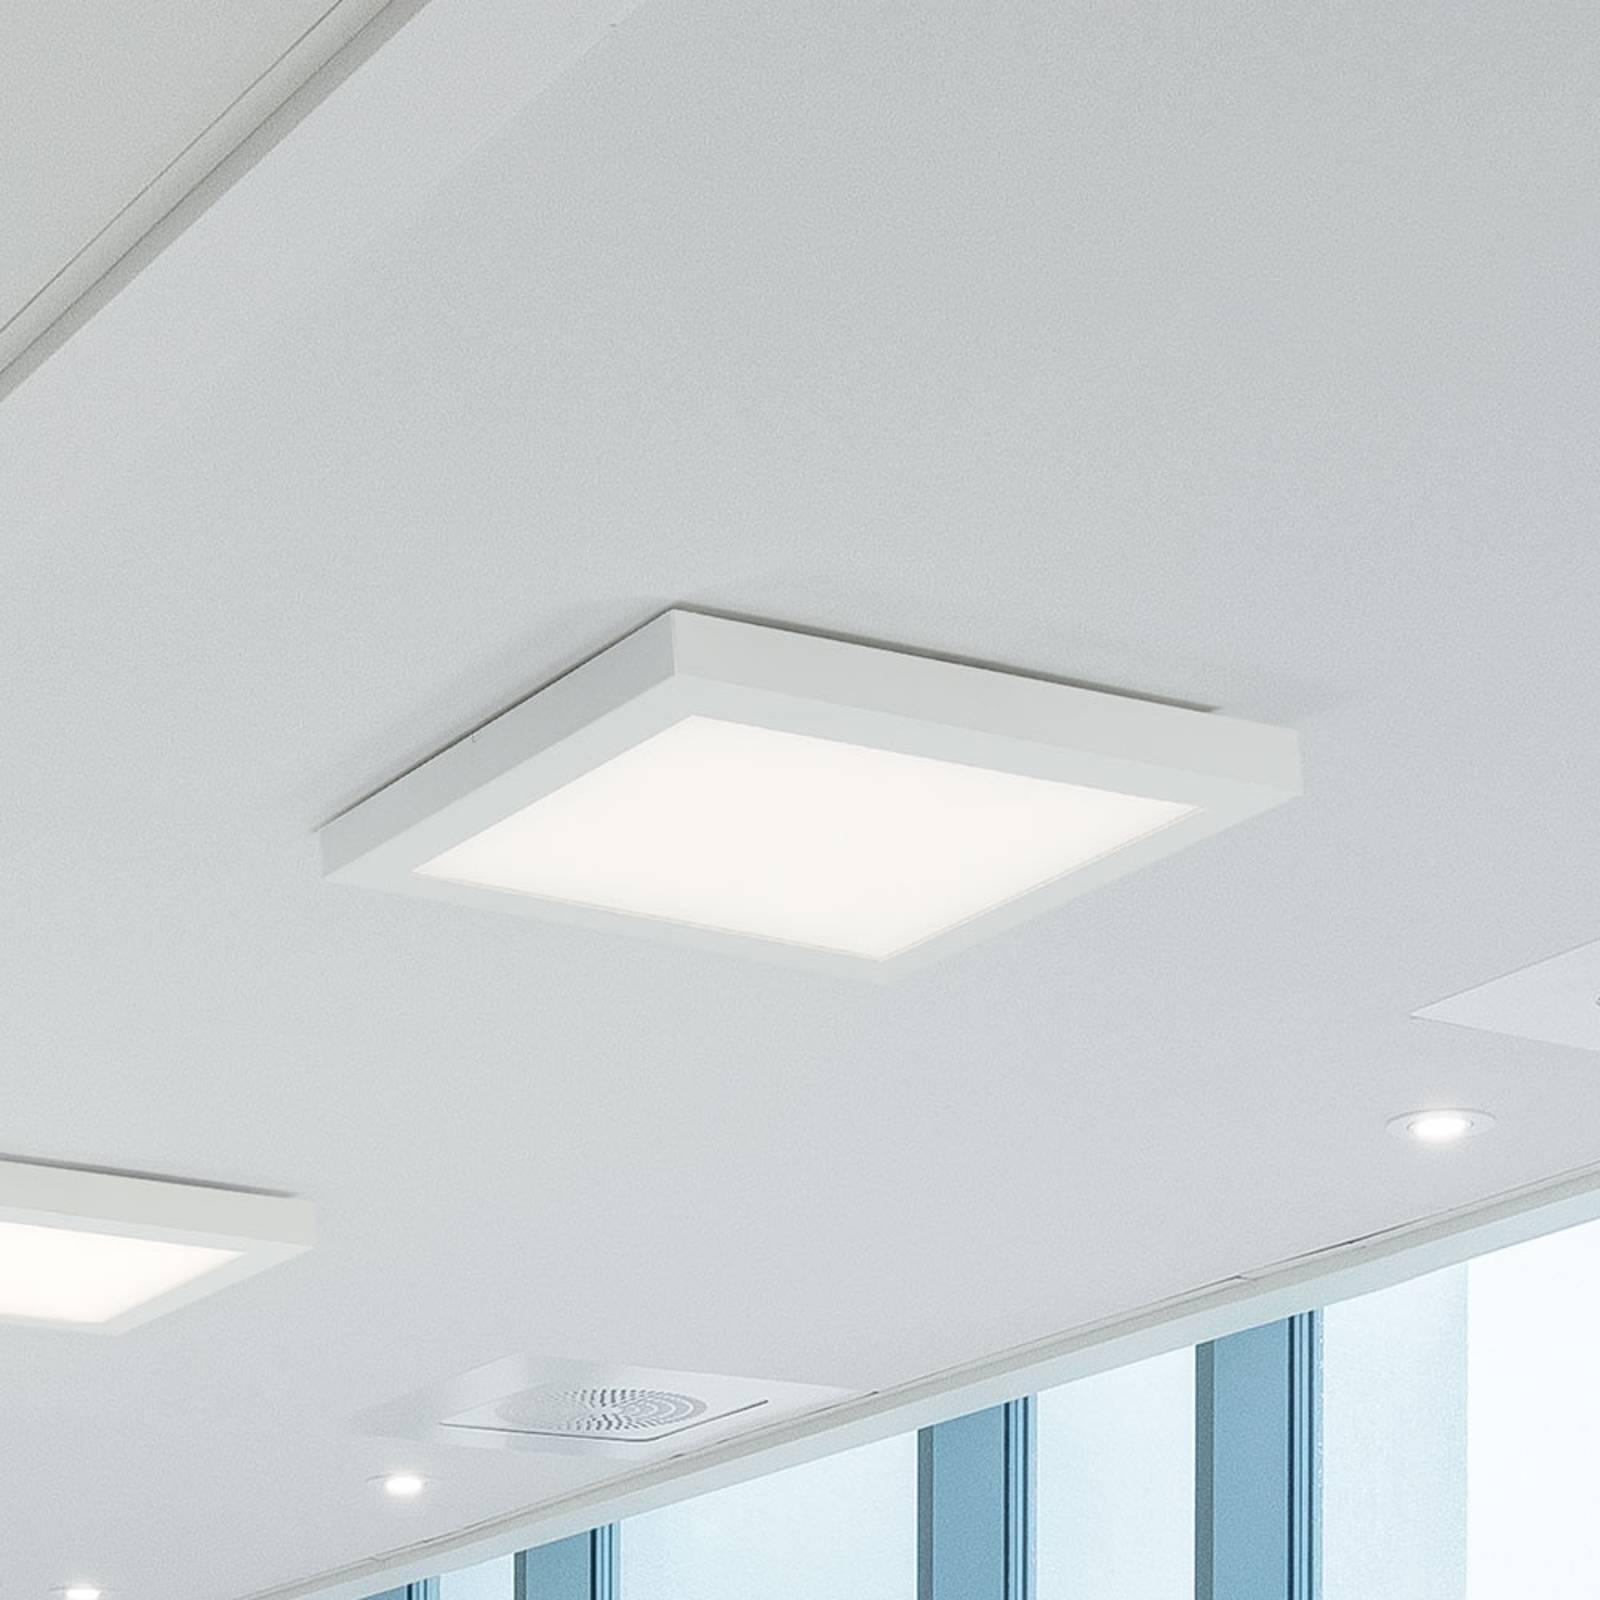 LED plafondlamp C70-S MP HF 57x57cm 3.988lm 830